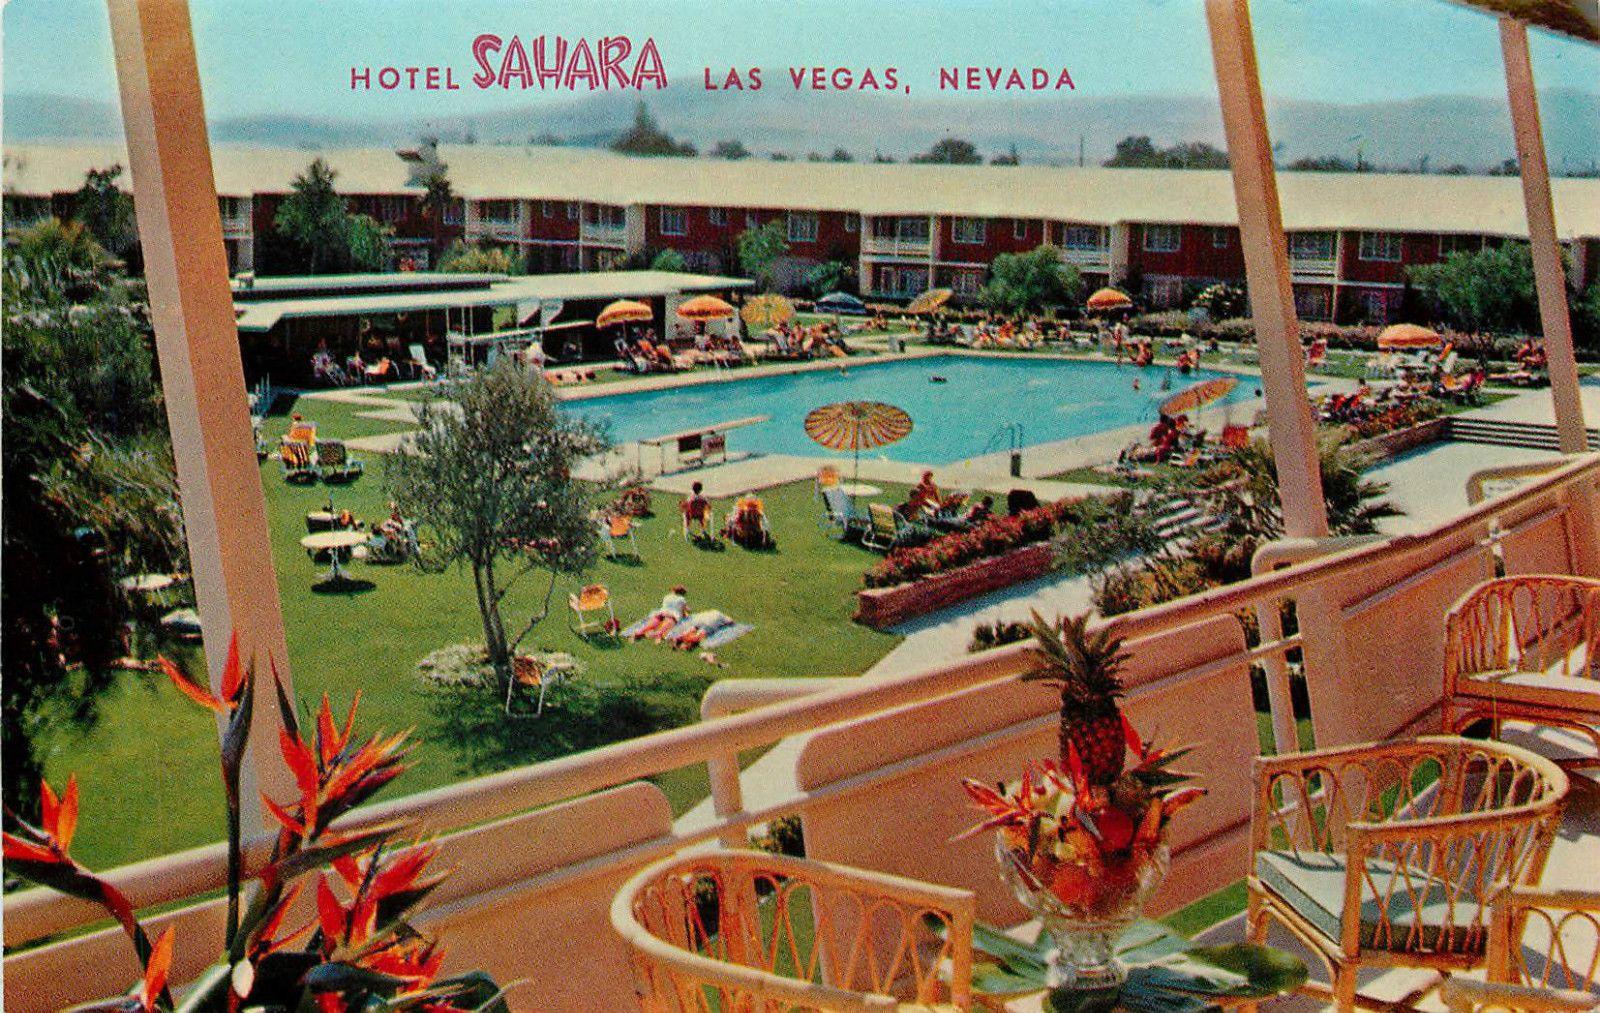 Las Vegas Nv Sahara Hotel Casino Swimming Pool Chrome P C